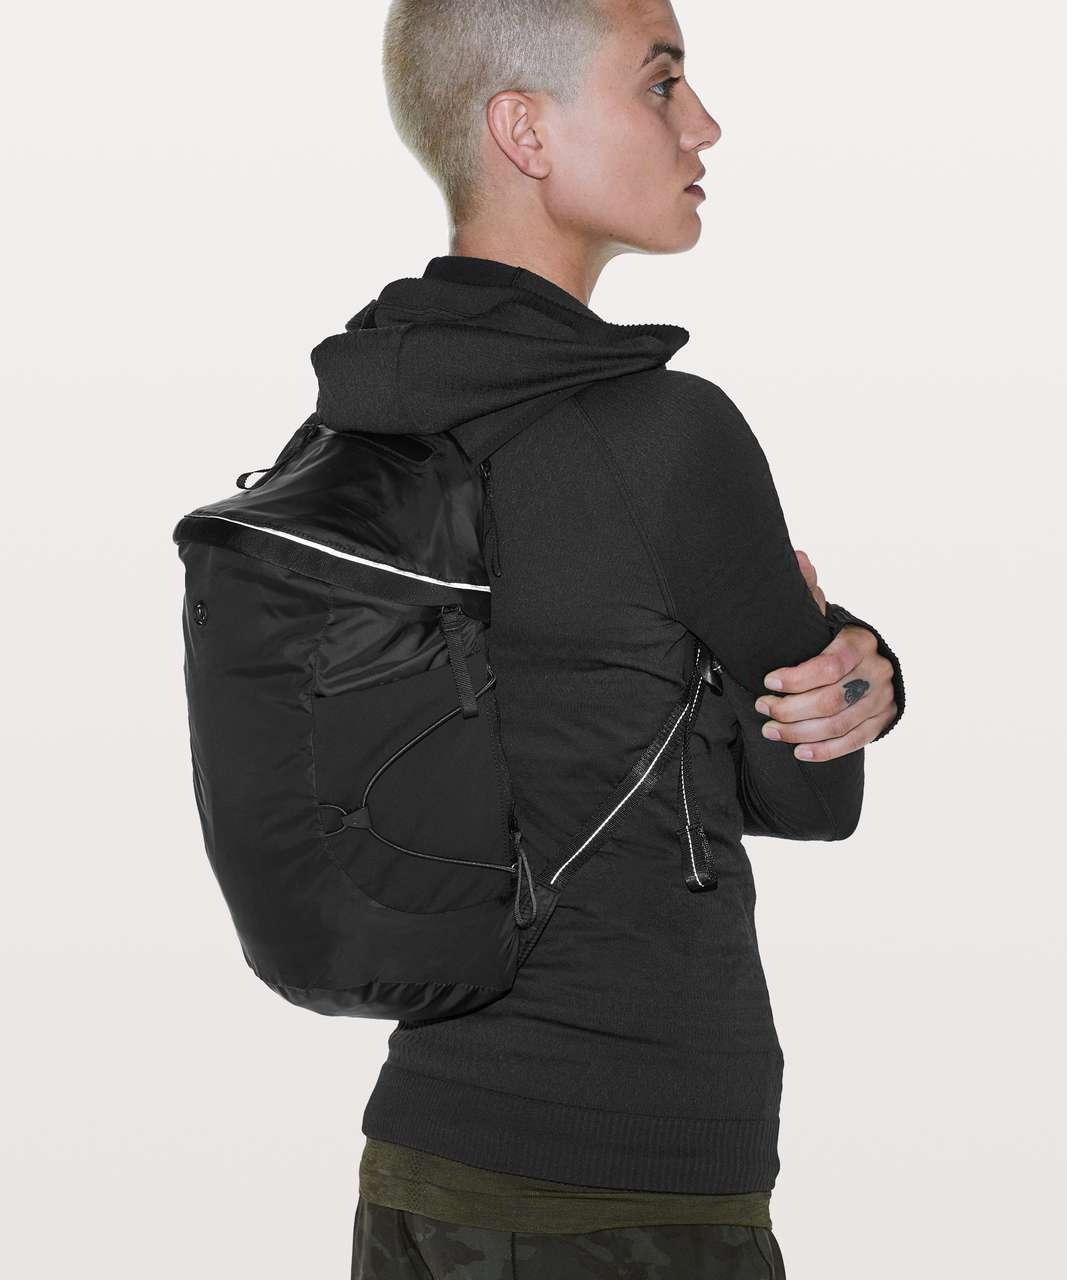 Lululemon Run All Day Backpack II *13L - Black